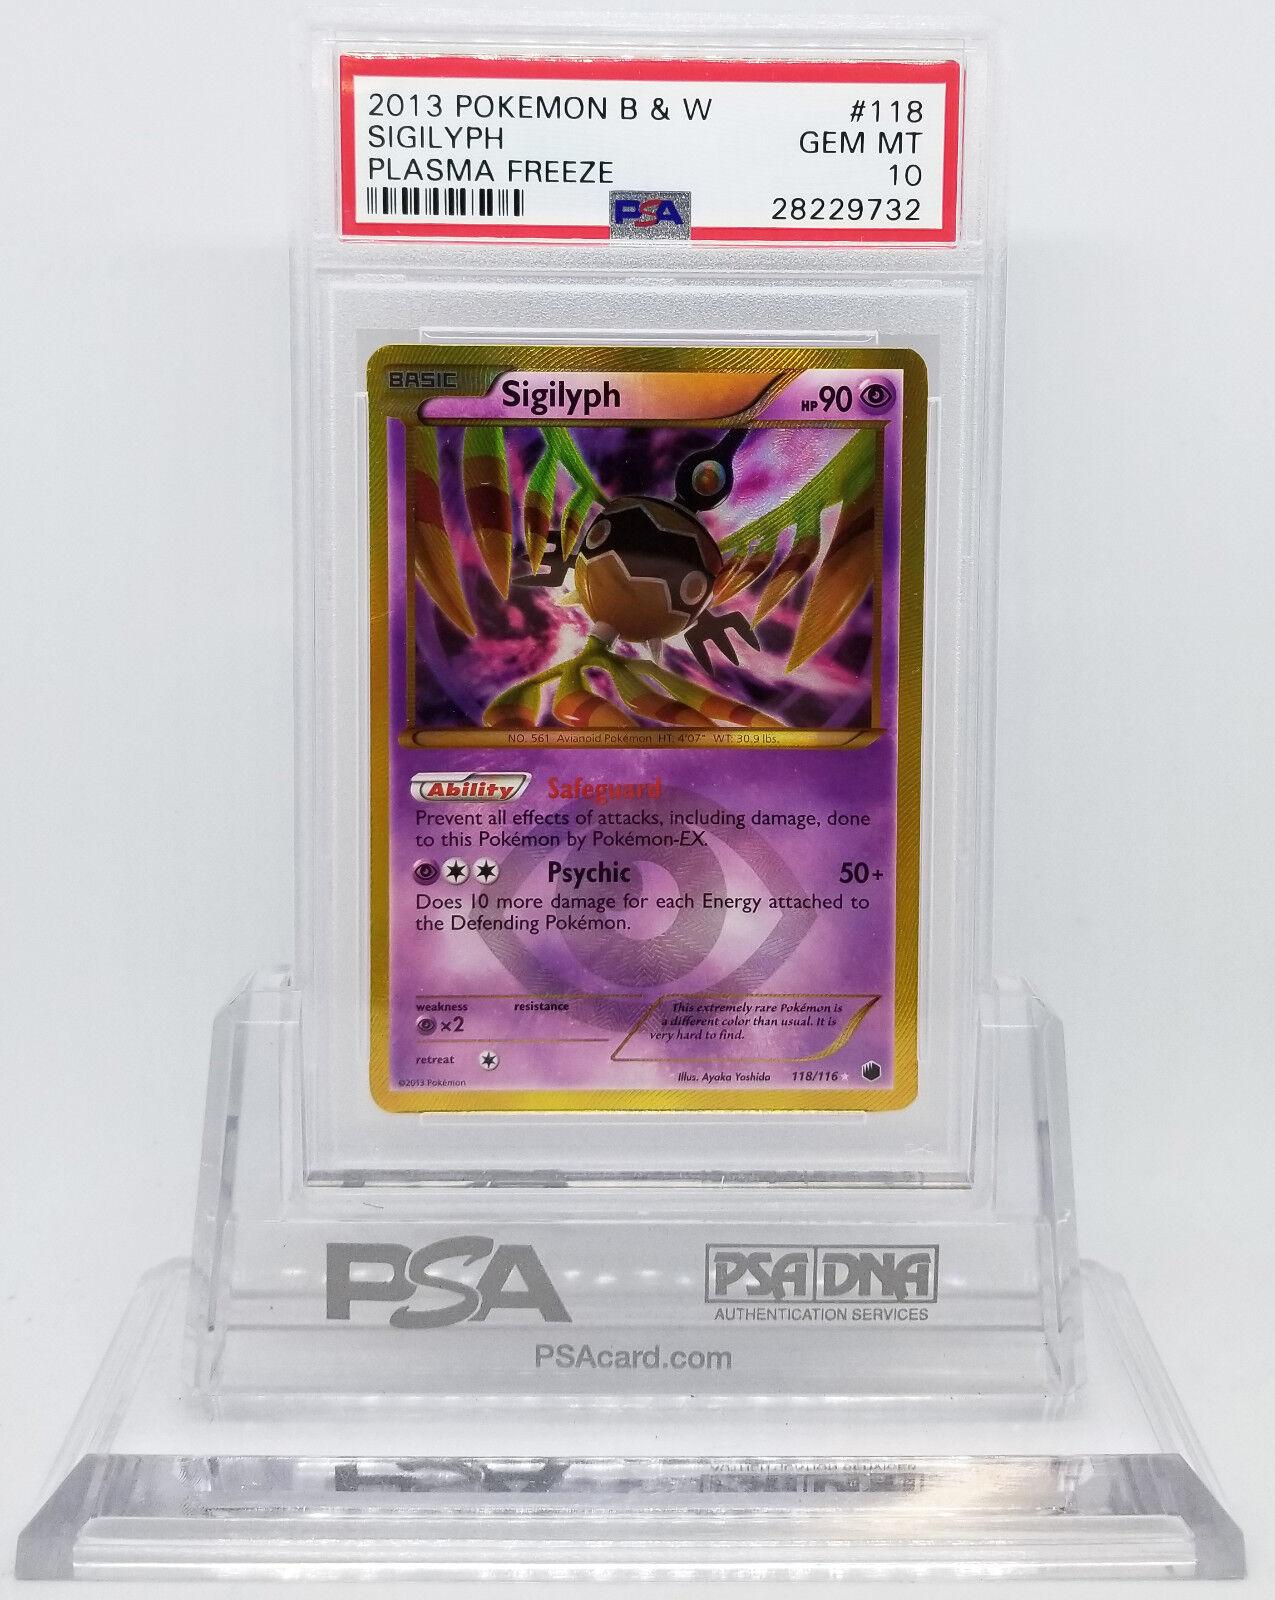 Pokemon BW PLASMA FRYS SIGLYPH 118  116 SECRET RARE PSA 10 GEM MINT